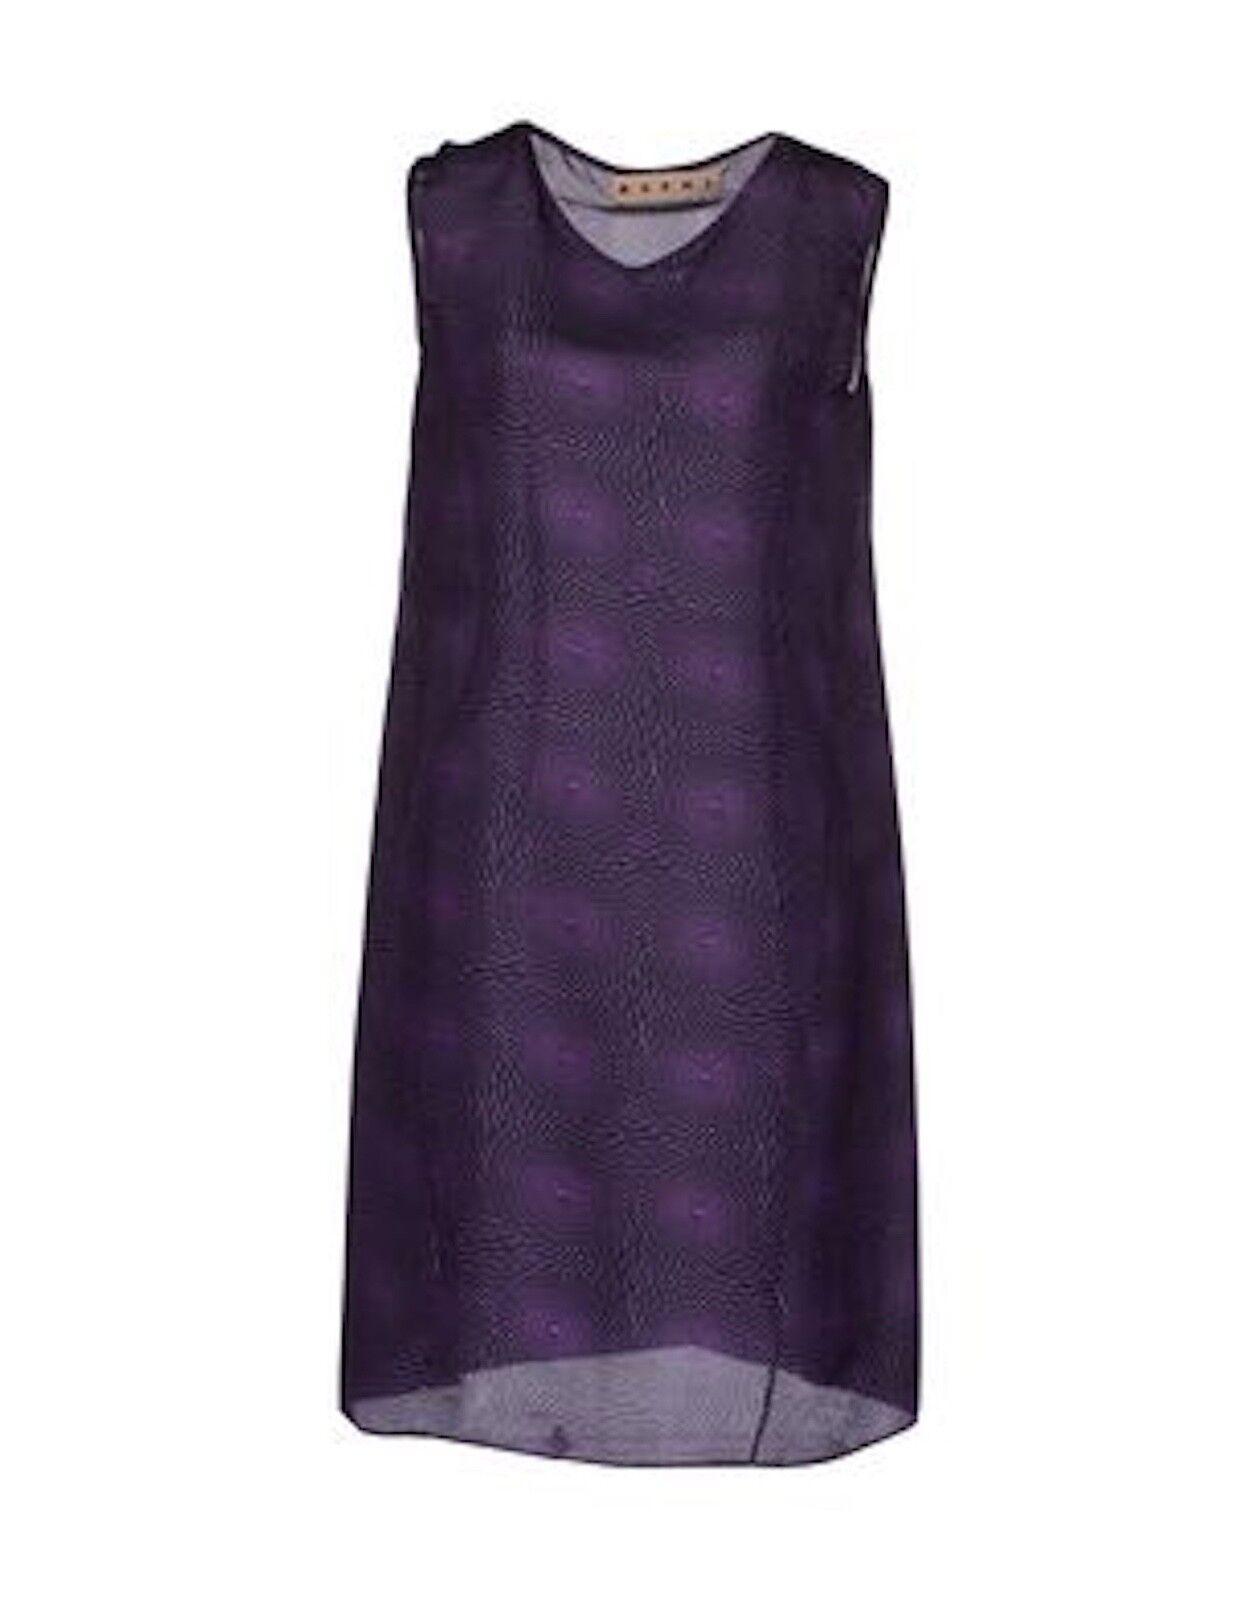 Marni lila and schwarz Print Silk Dress, IT40 US4